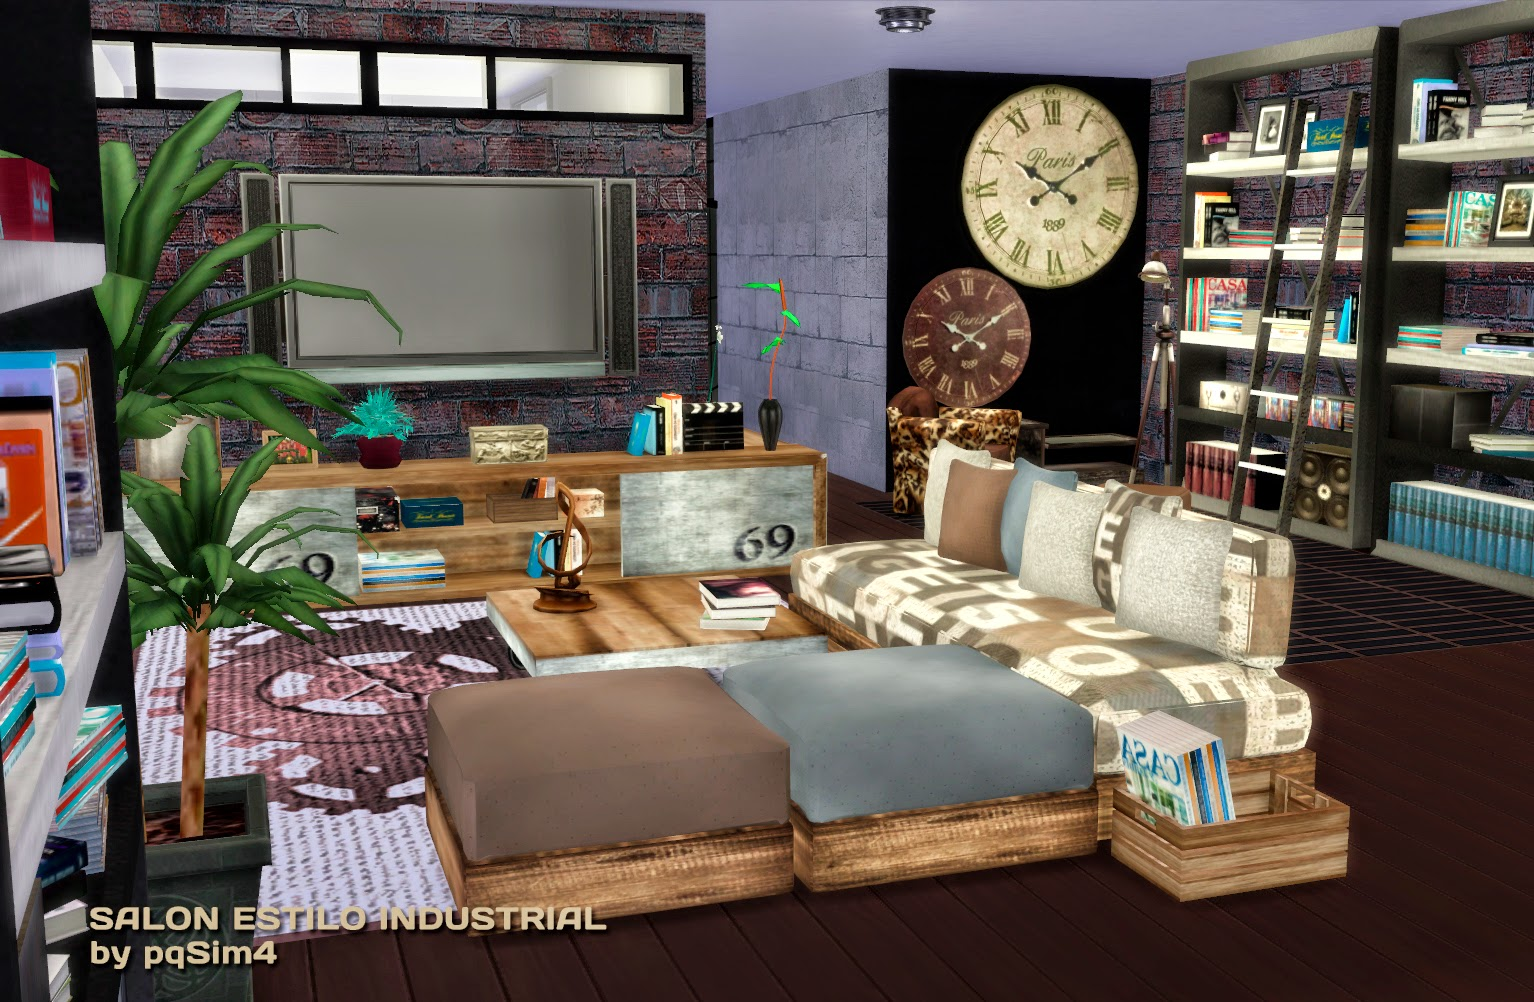 Sims 4 sal n estilo industrial for Salon moderne sims 4